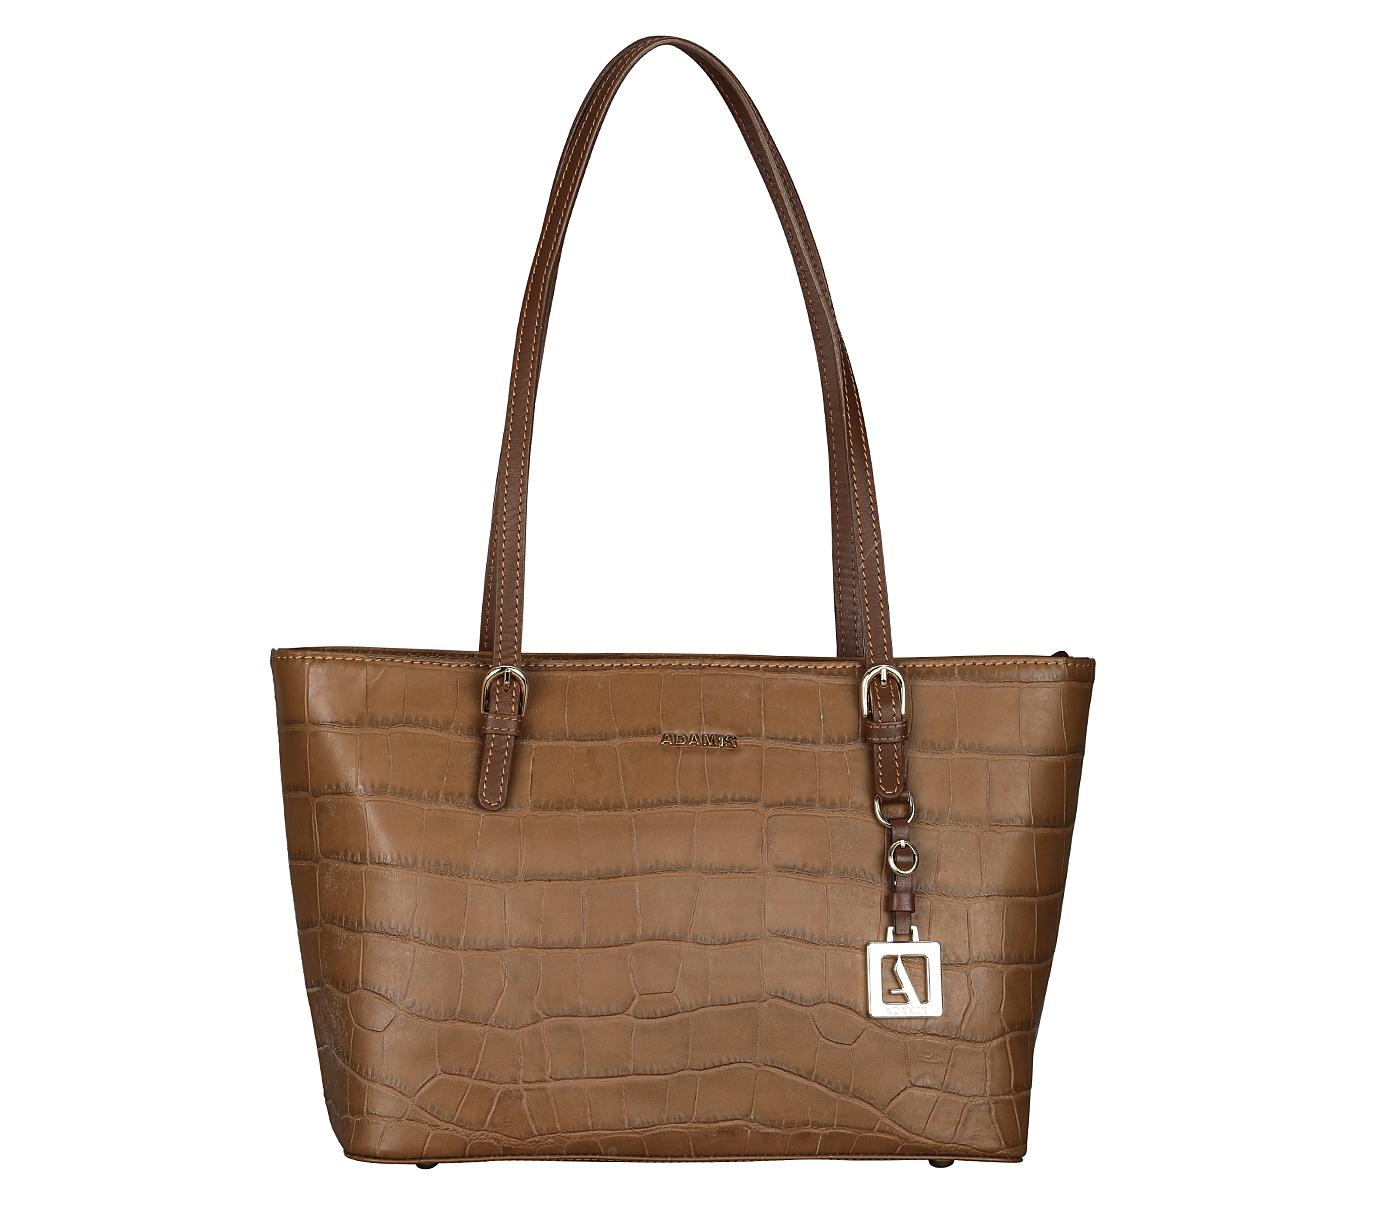 Handbag - B887